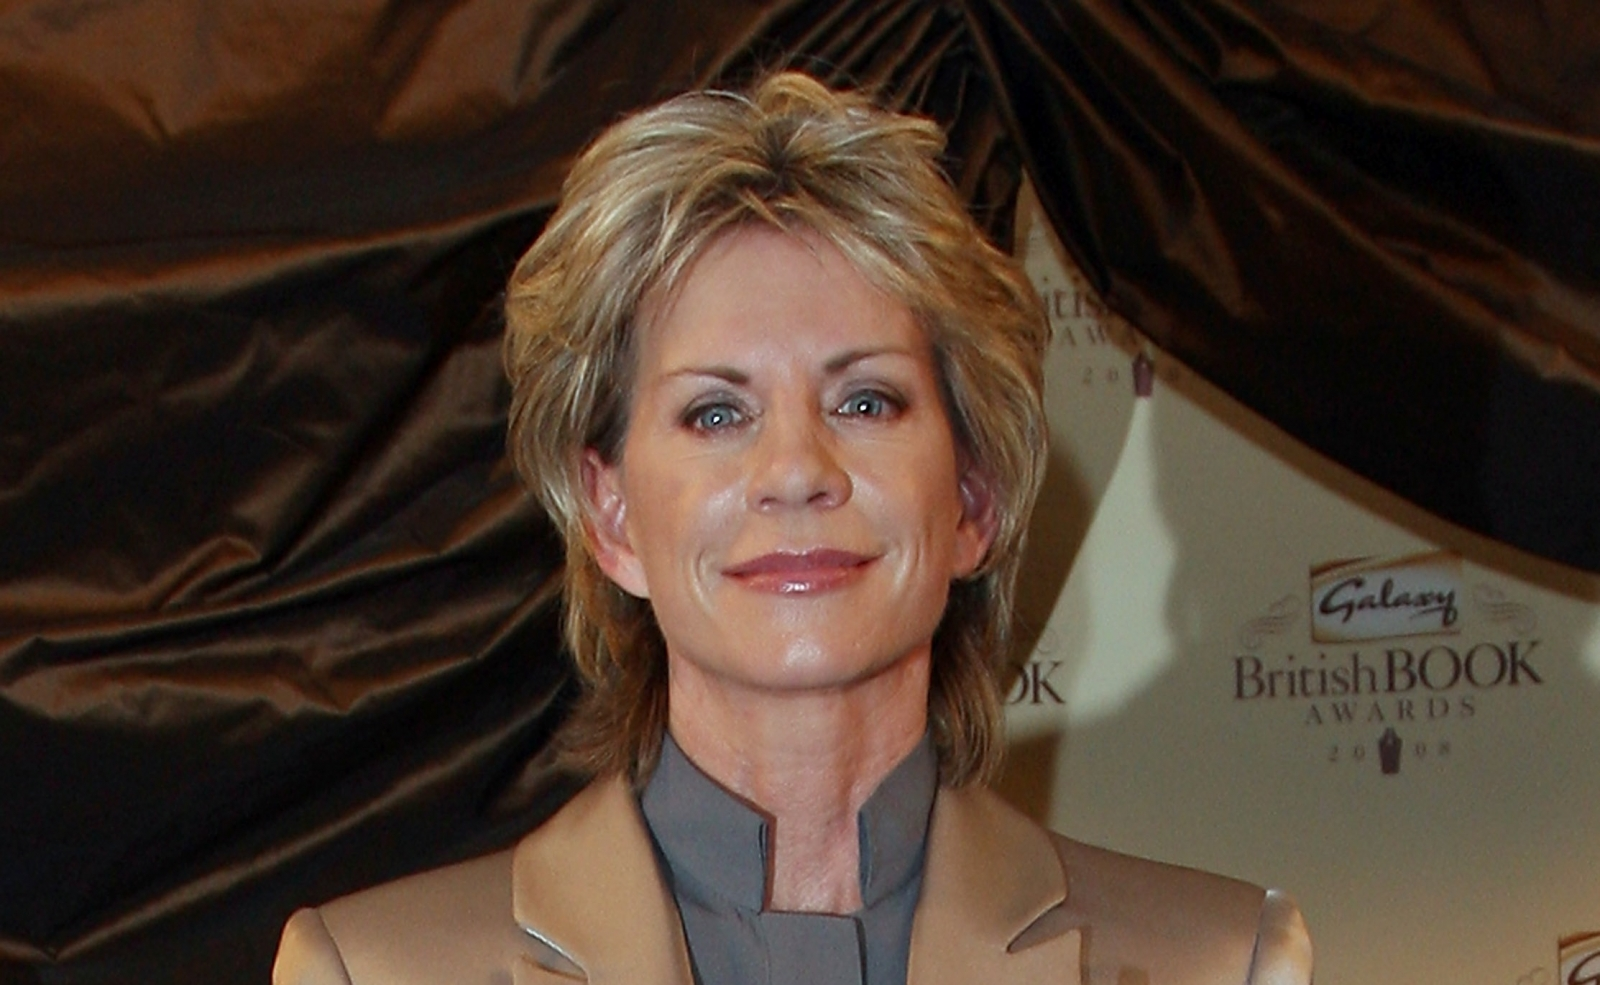 Patricia Cornwell in 2008